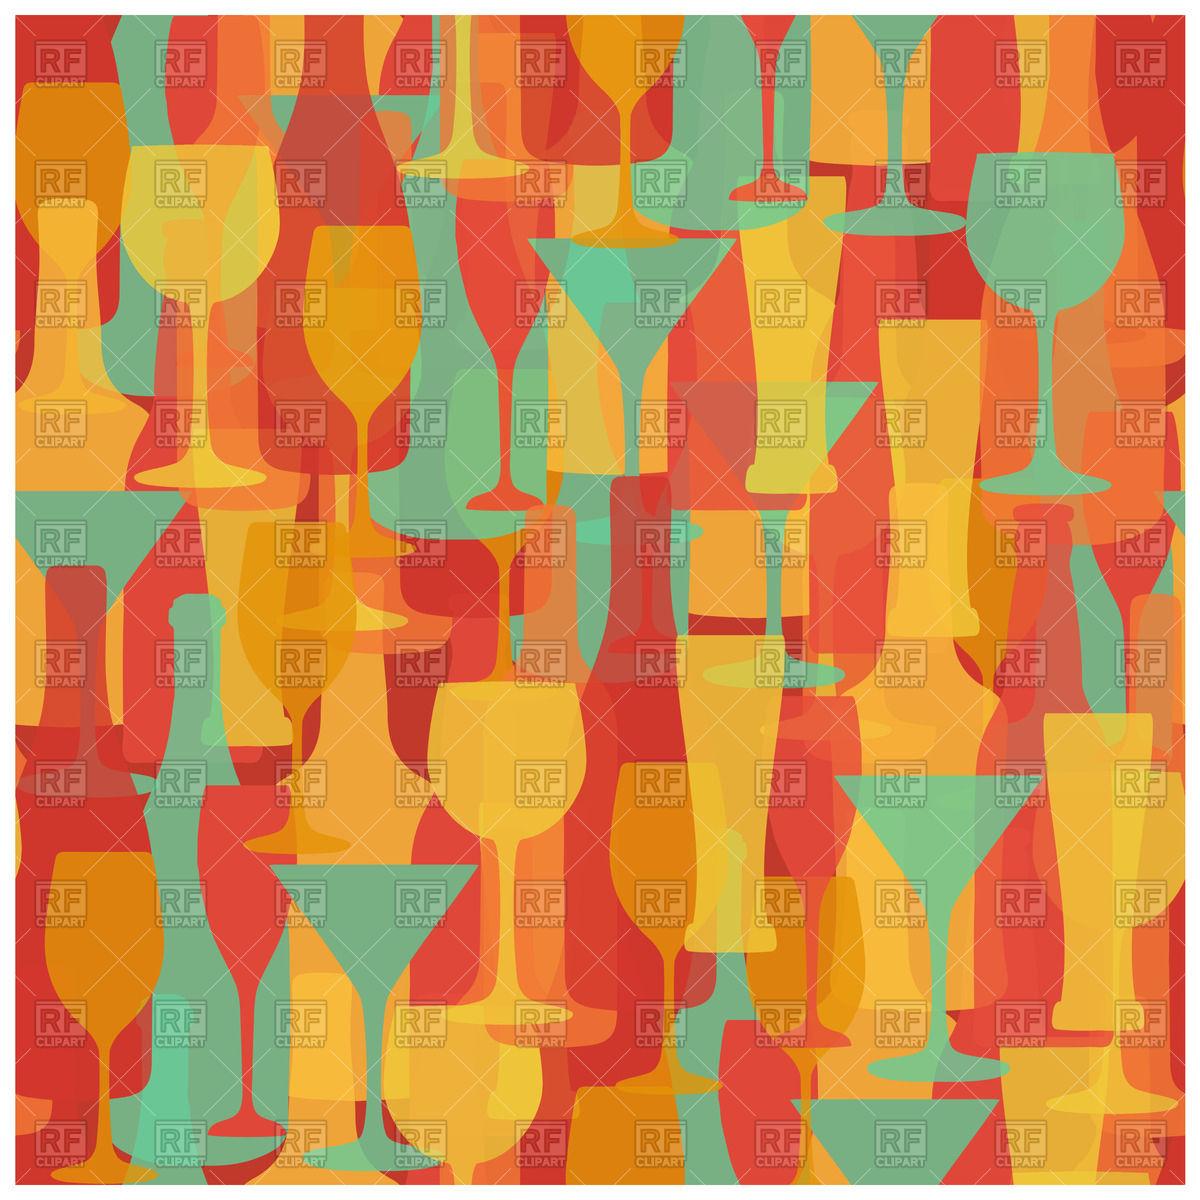 37+] Alcohol Backgrounds on WallpaperSafari.